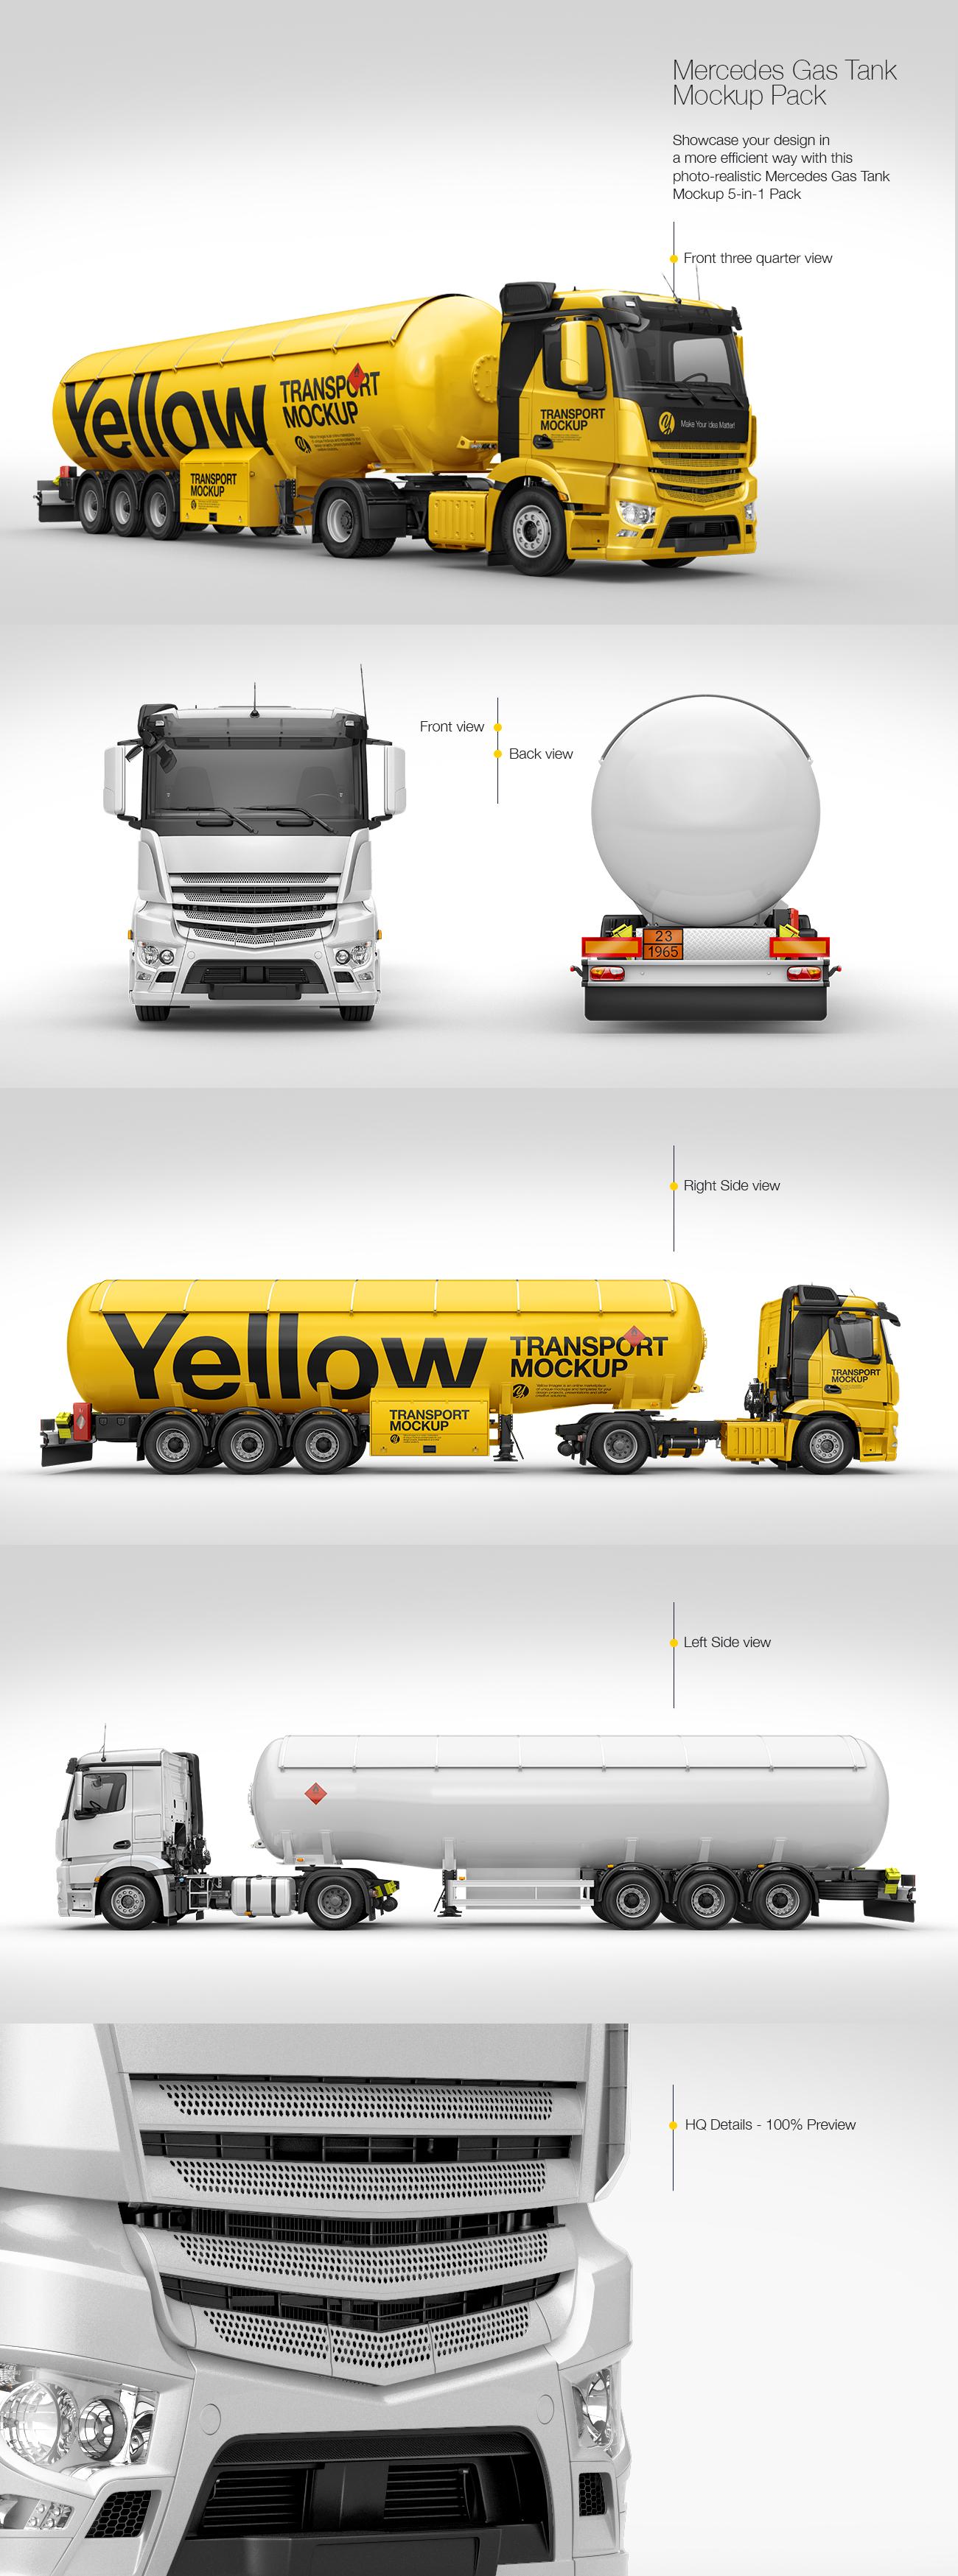 Mercedes-Benz Gas Tank Mockup Pack